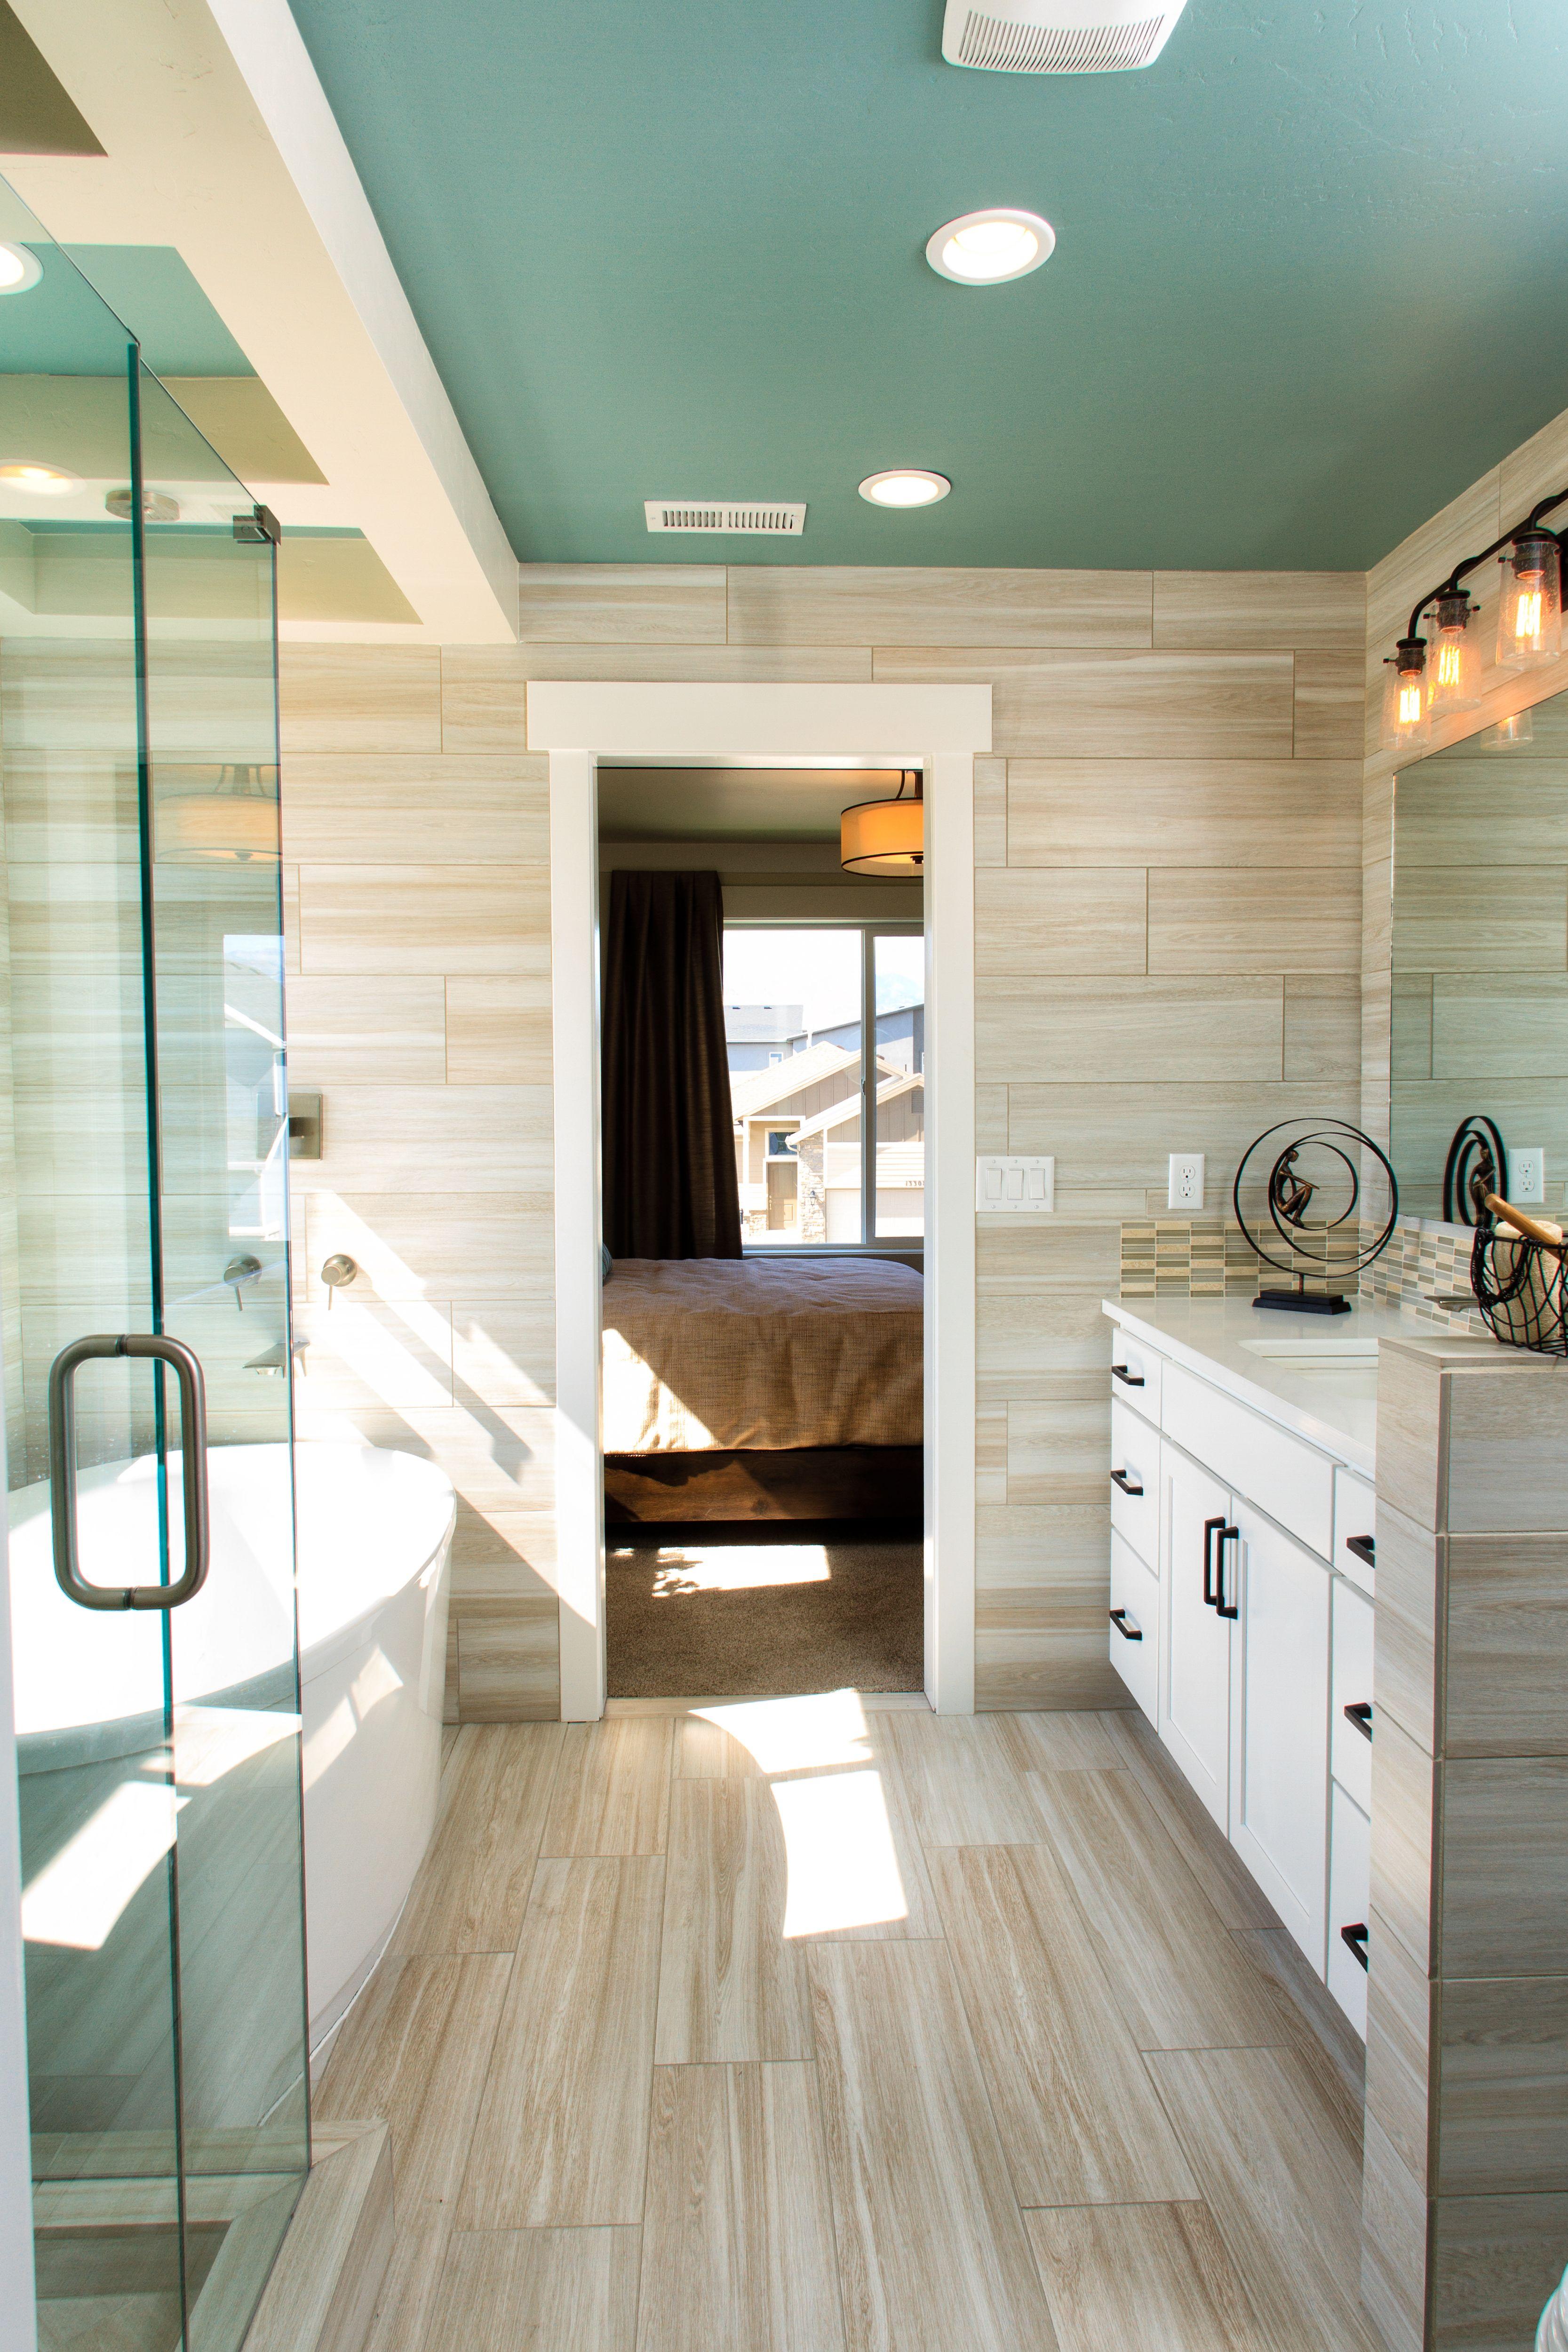 Bathroom Decor Ideas Holmes Homes | Bathroom | Pinterest | Front ...